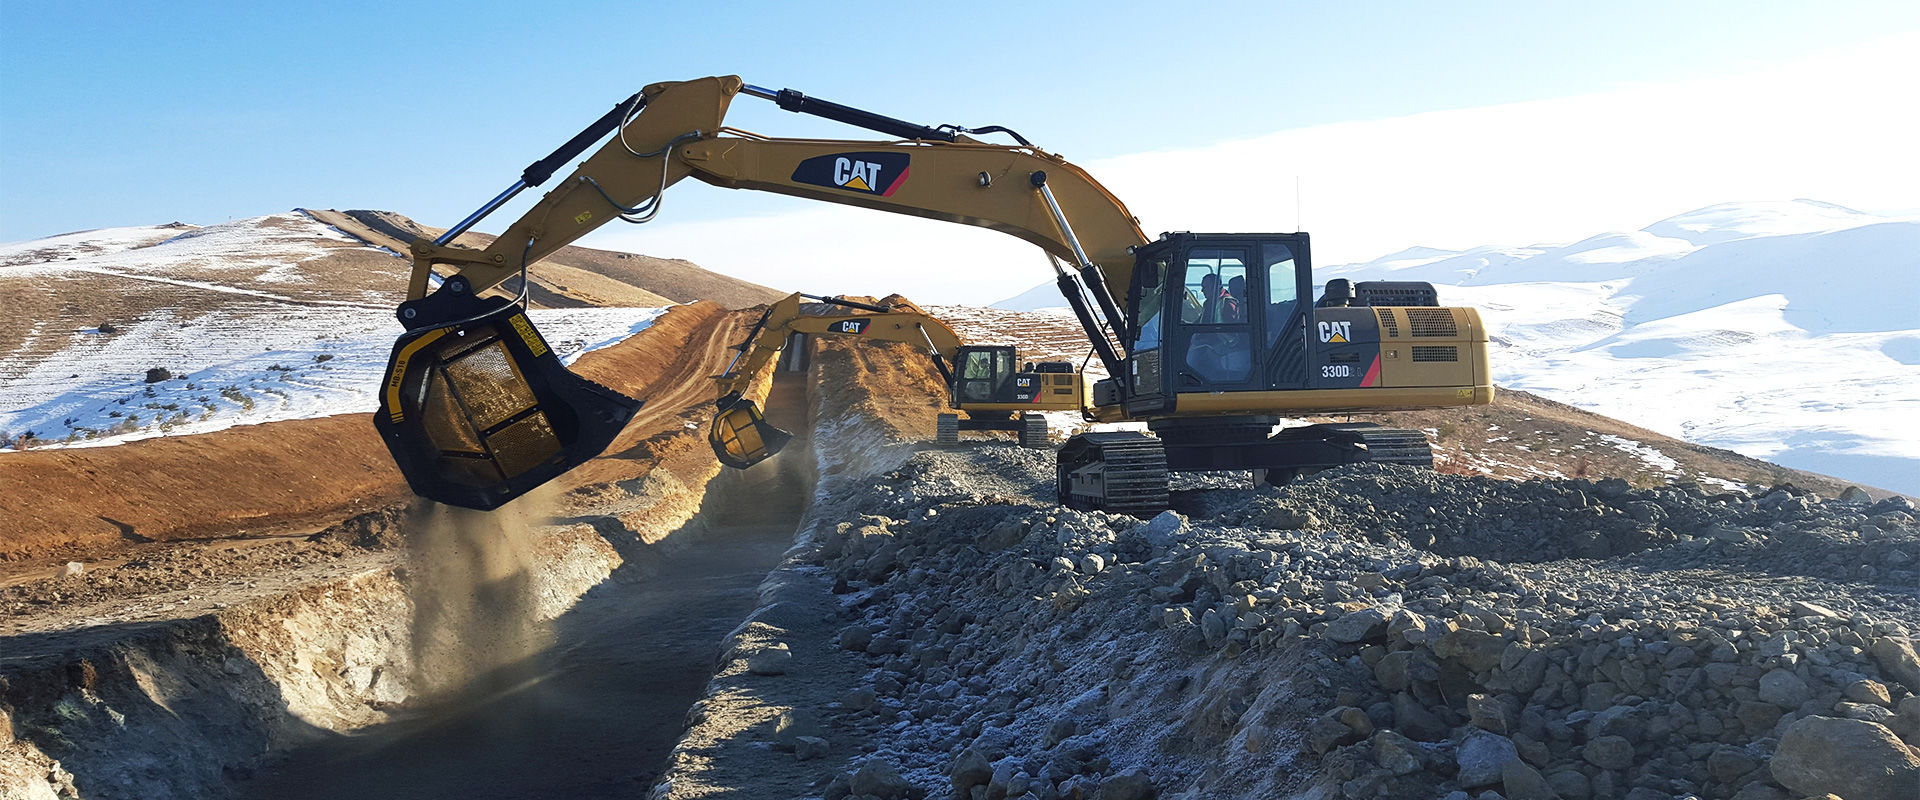 MB-S18 - Caterpillar - Turkey - Caucasus Pipeline Project